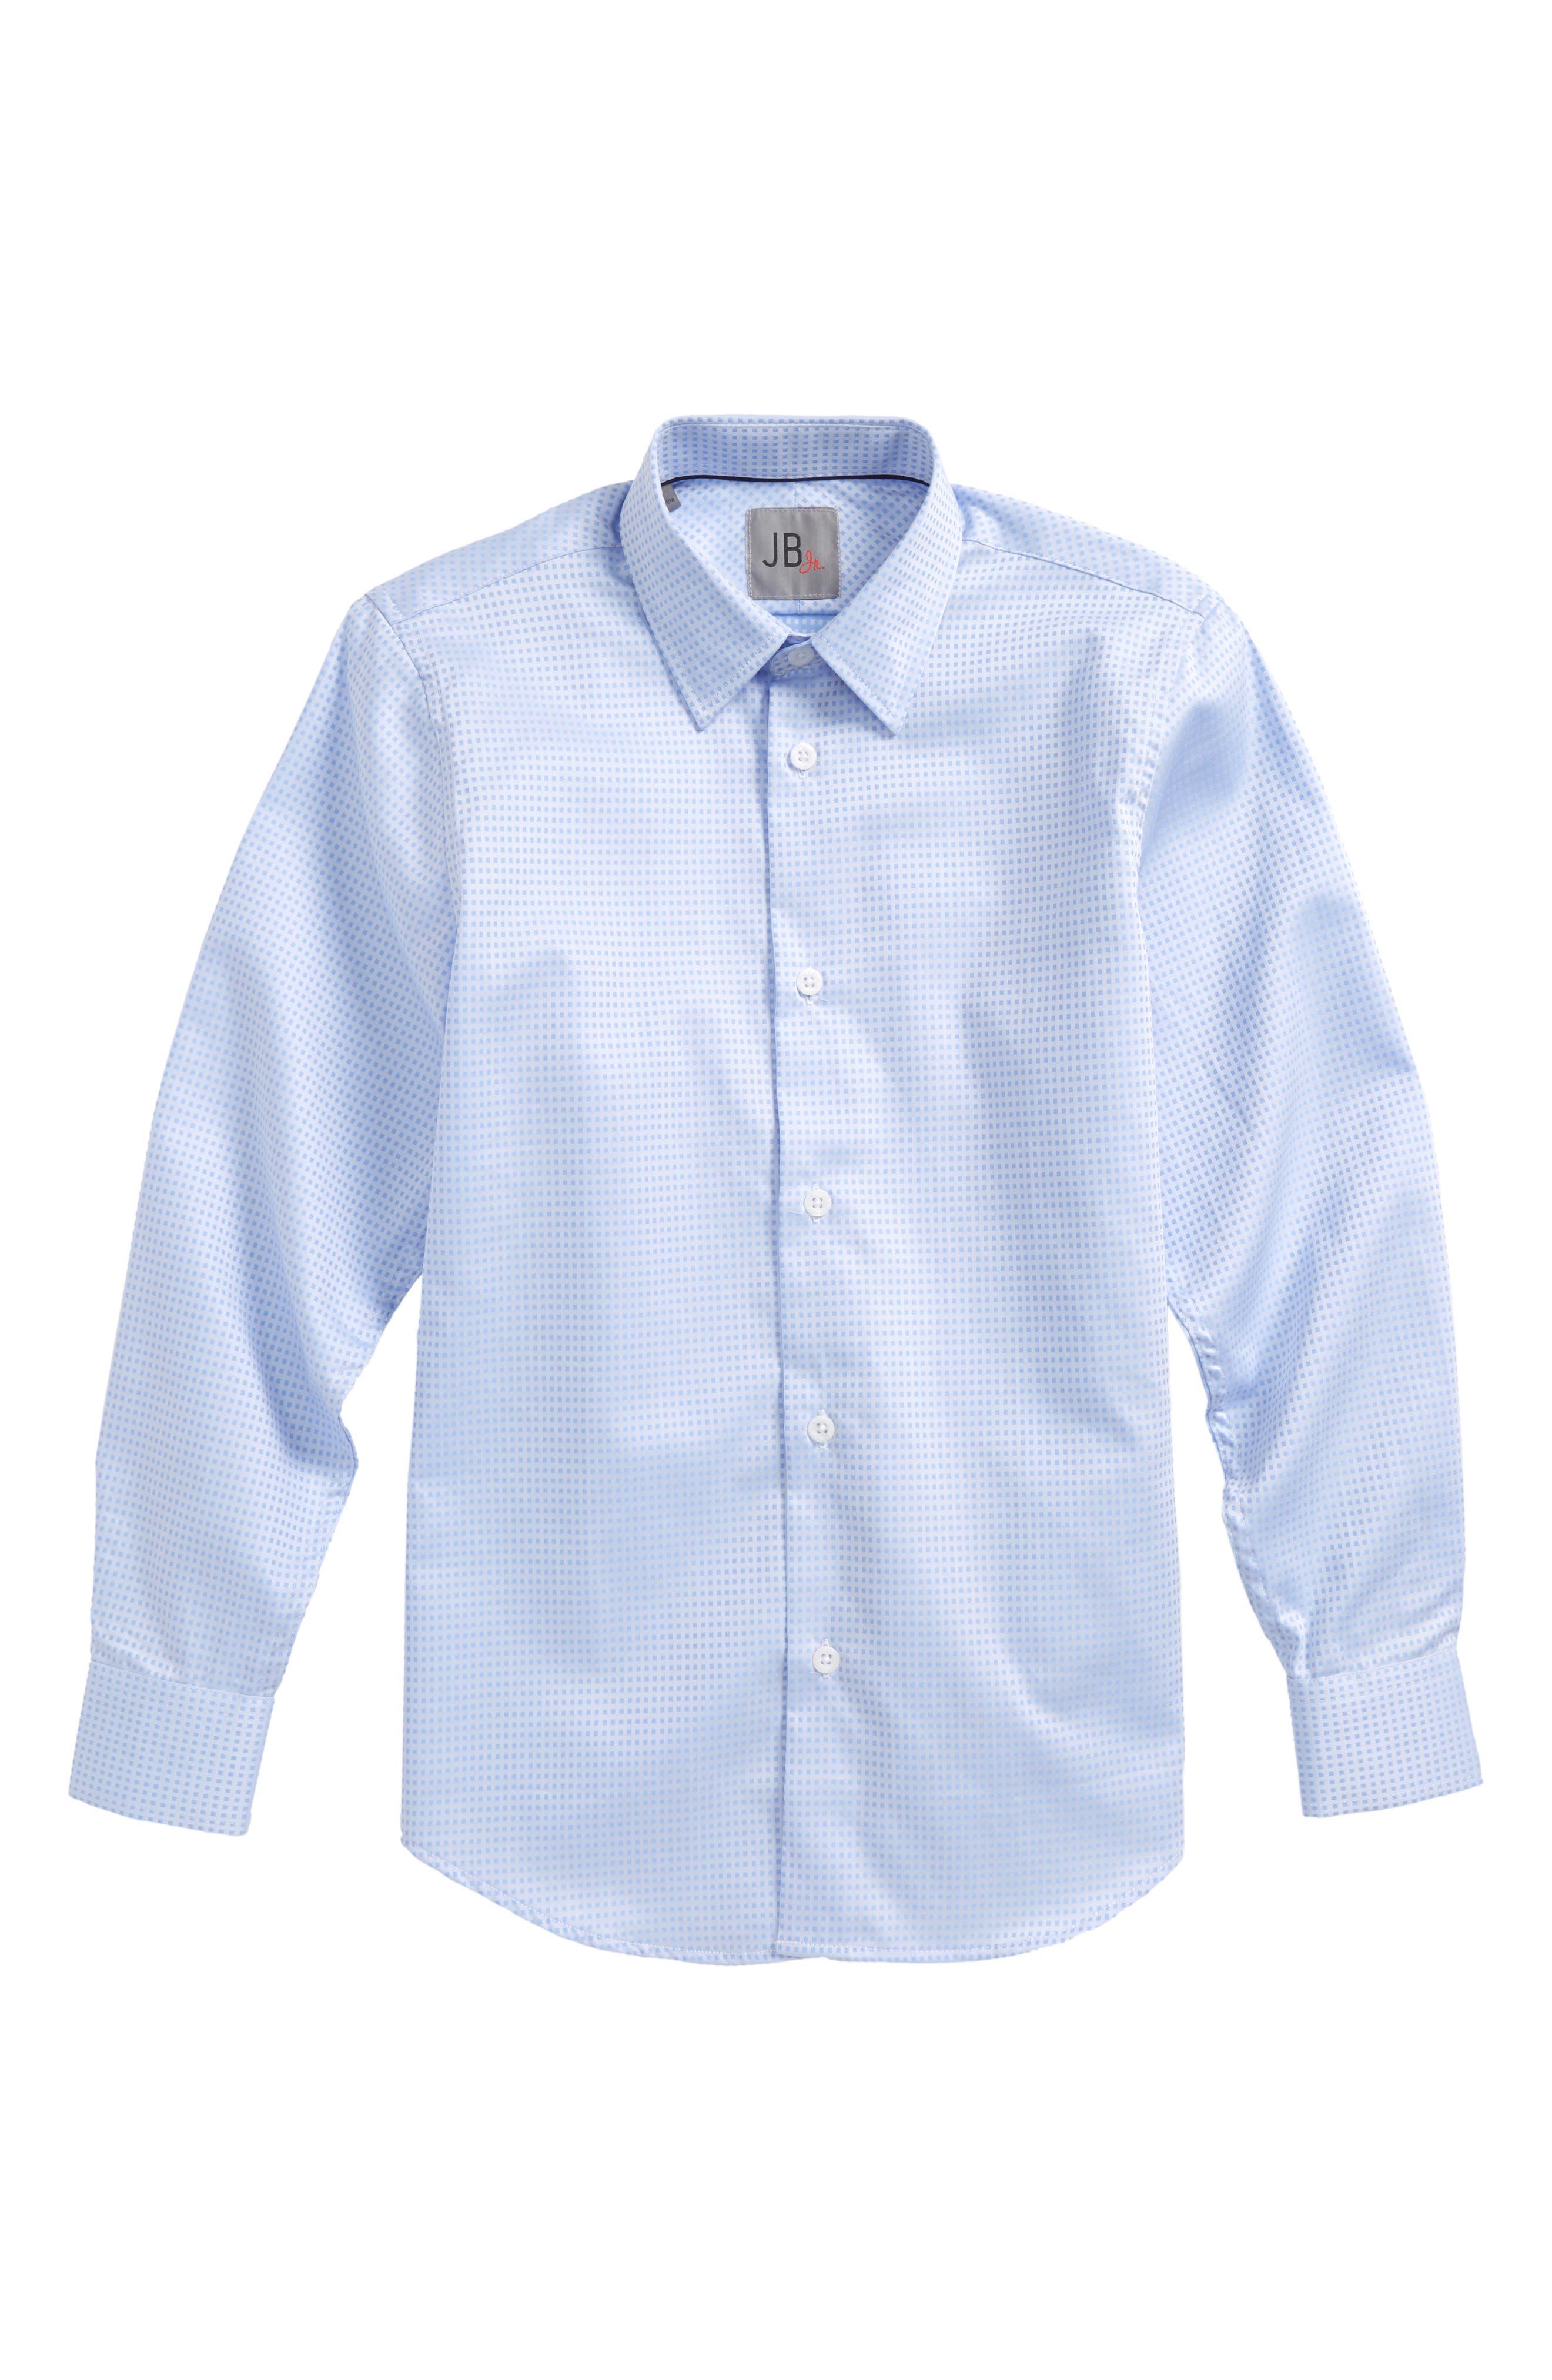 Microcheck Dress Shirt,                         Main,                         color, 430